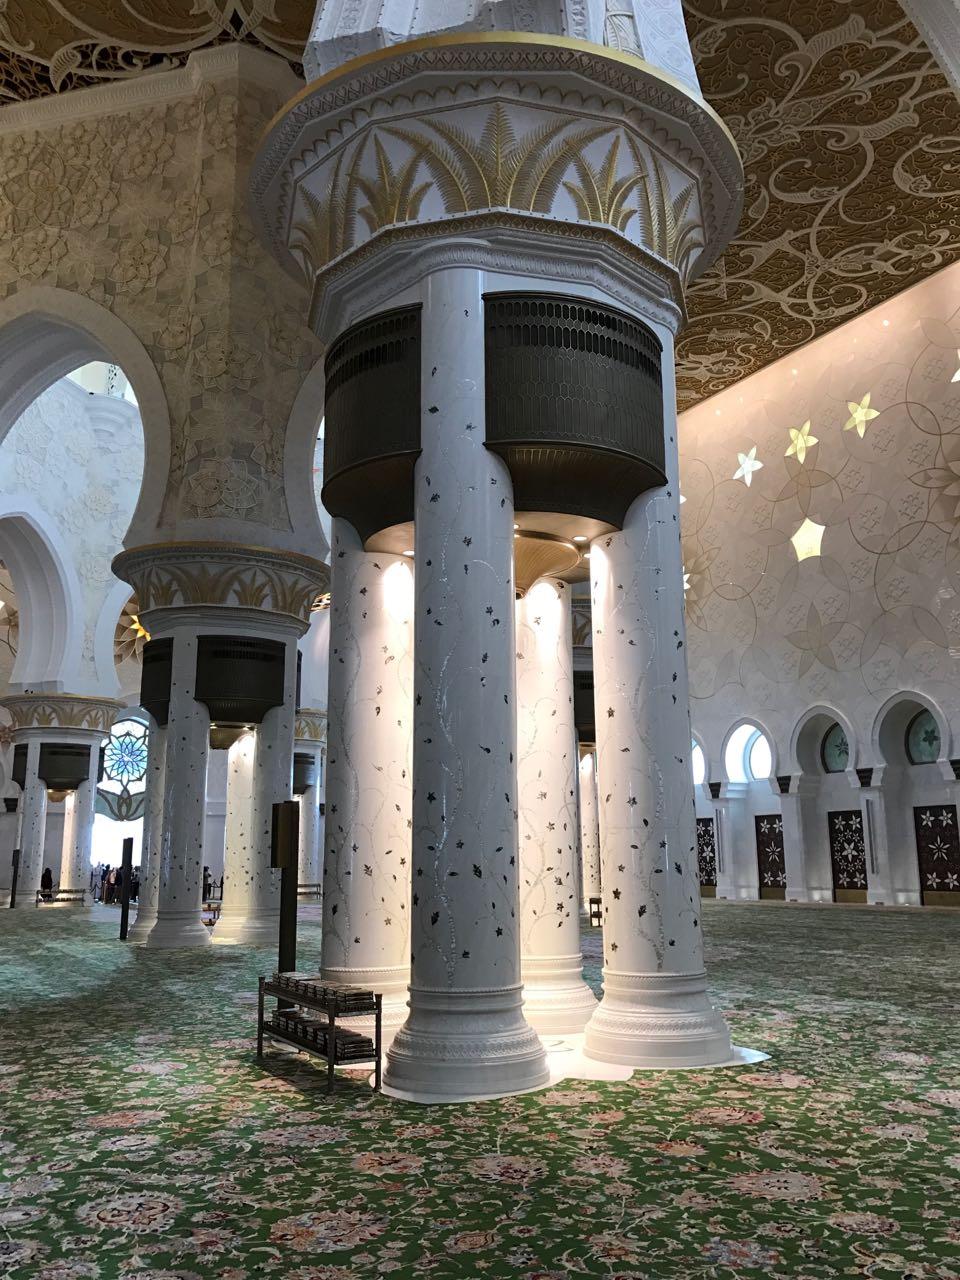 Pillars at the Grand Mosque In Dubai.